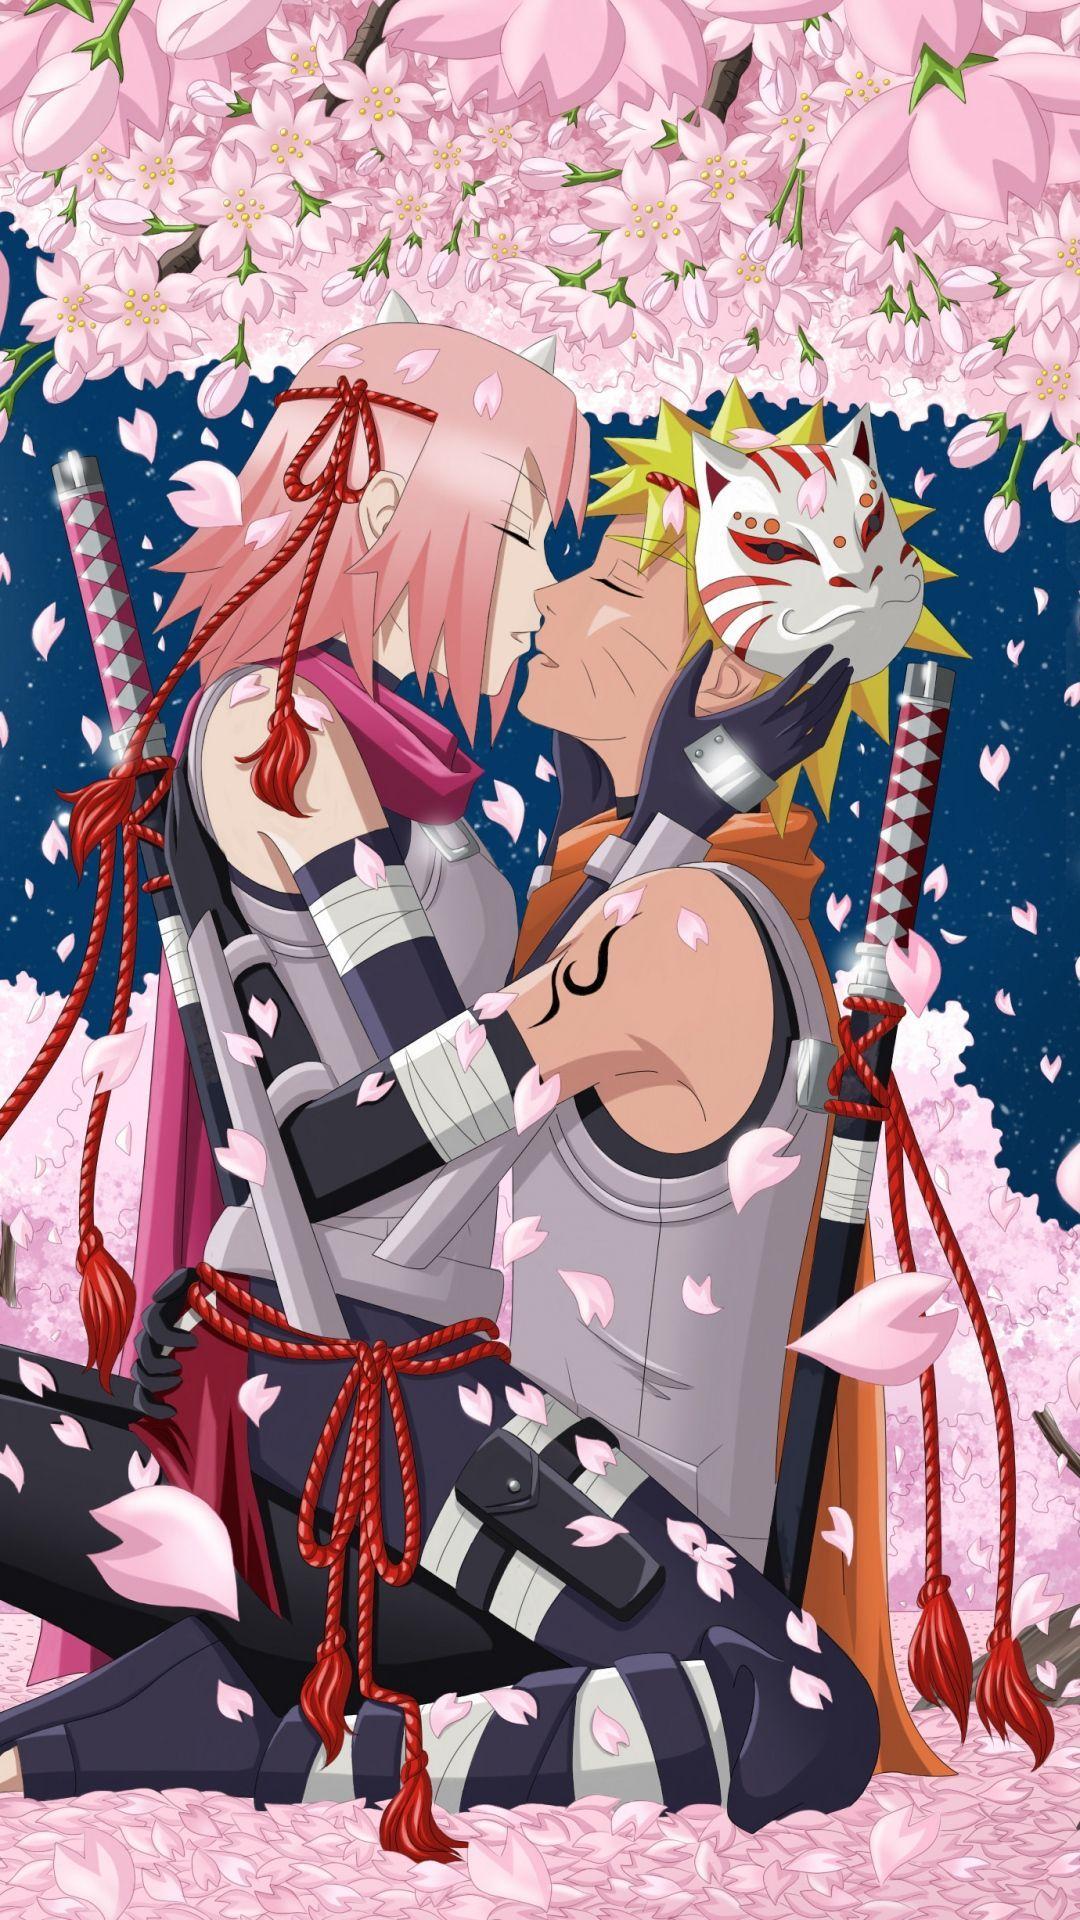 Get Latest Retro Anime Wallpaper IPhone Anime Naruto